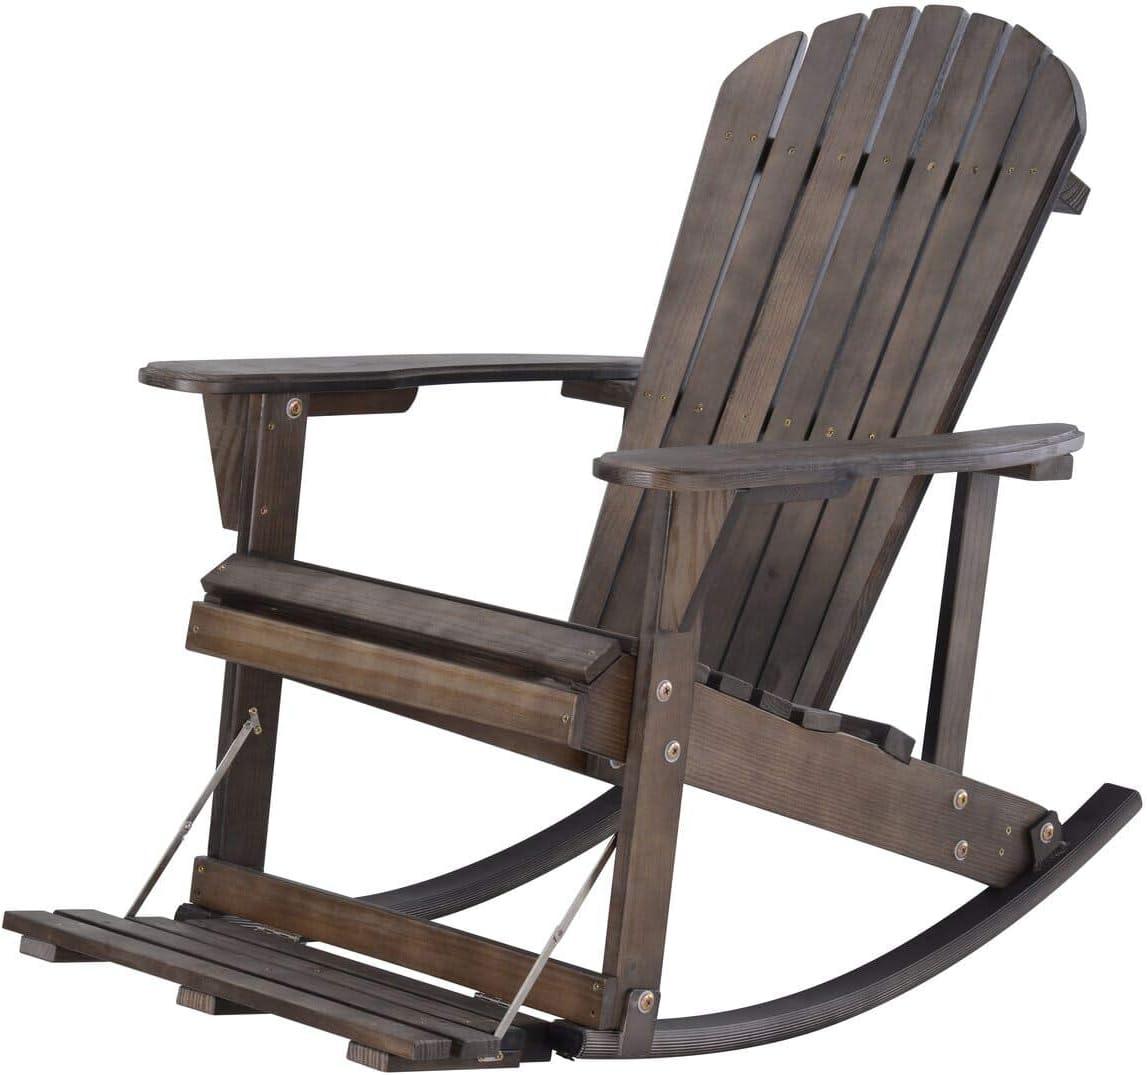 WUnlimited SW2007DB-R Max 65% OFF Adirondack Rocking Chair Brown Dark Cheap mail order shopping